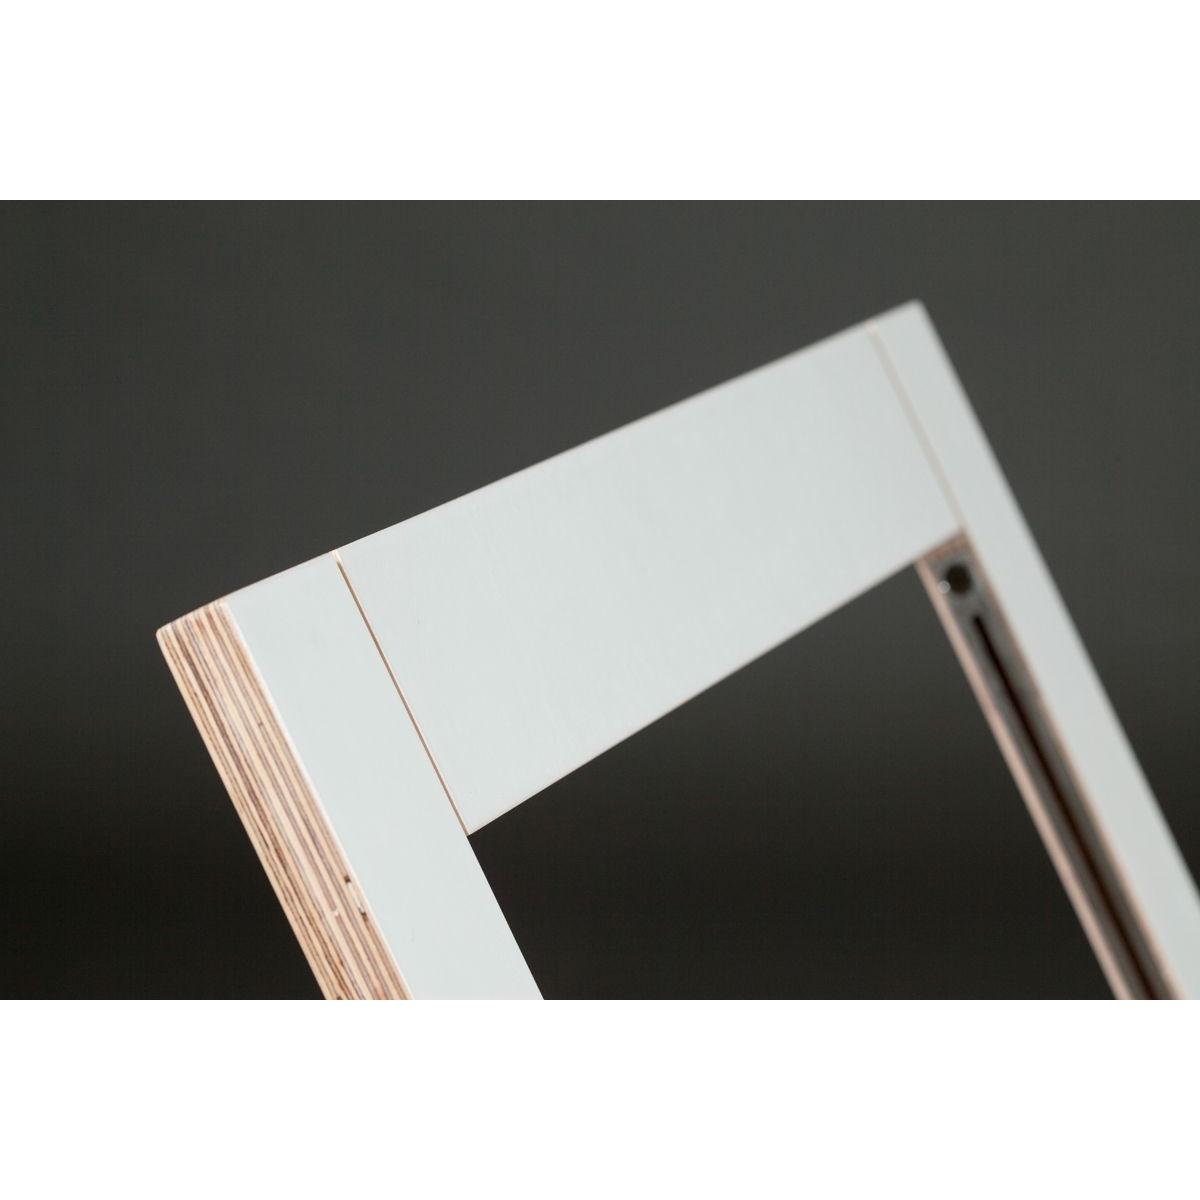 Folding Chair Fläpps | White